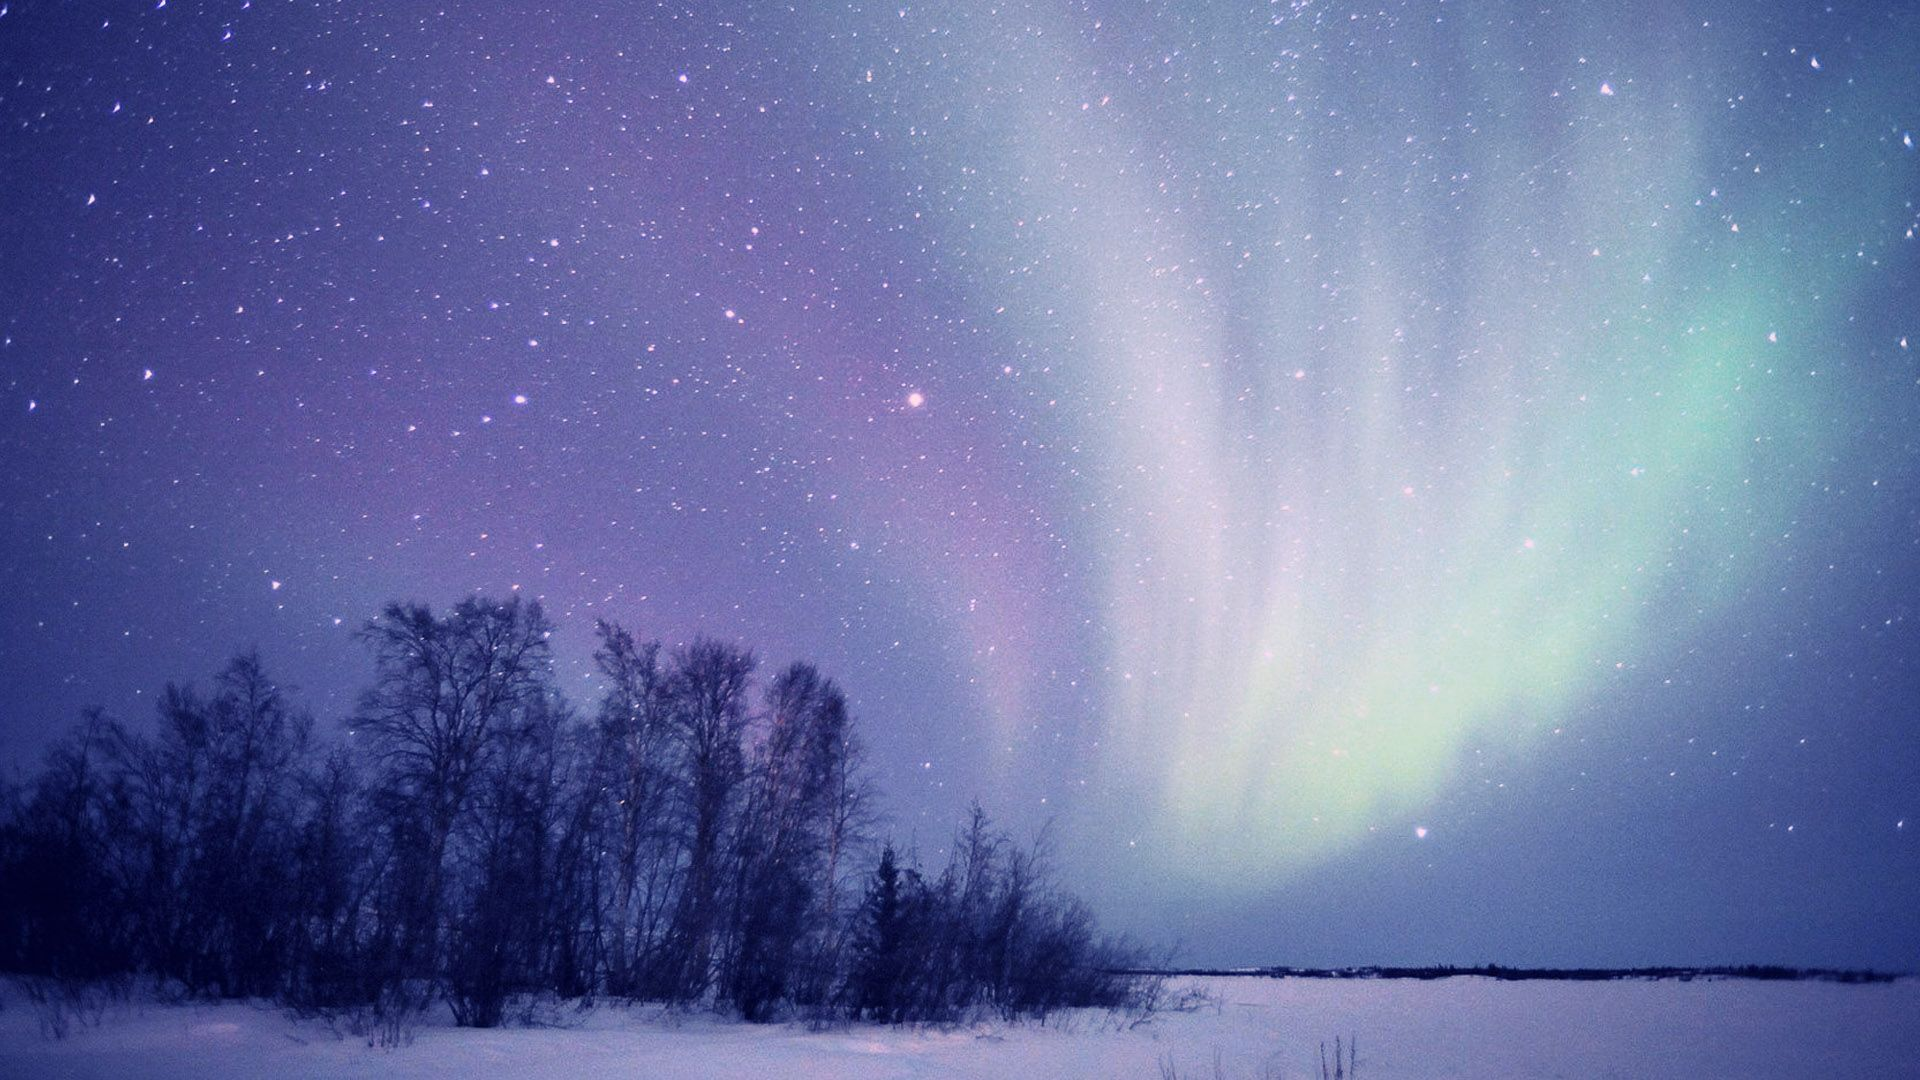 Aurora Borealis HD Wallpaper Android 1920x1080